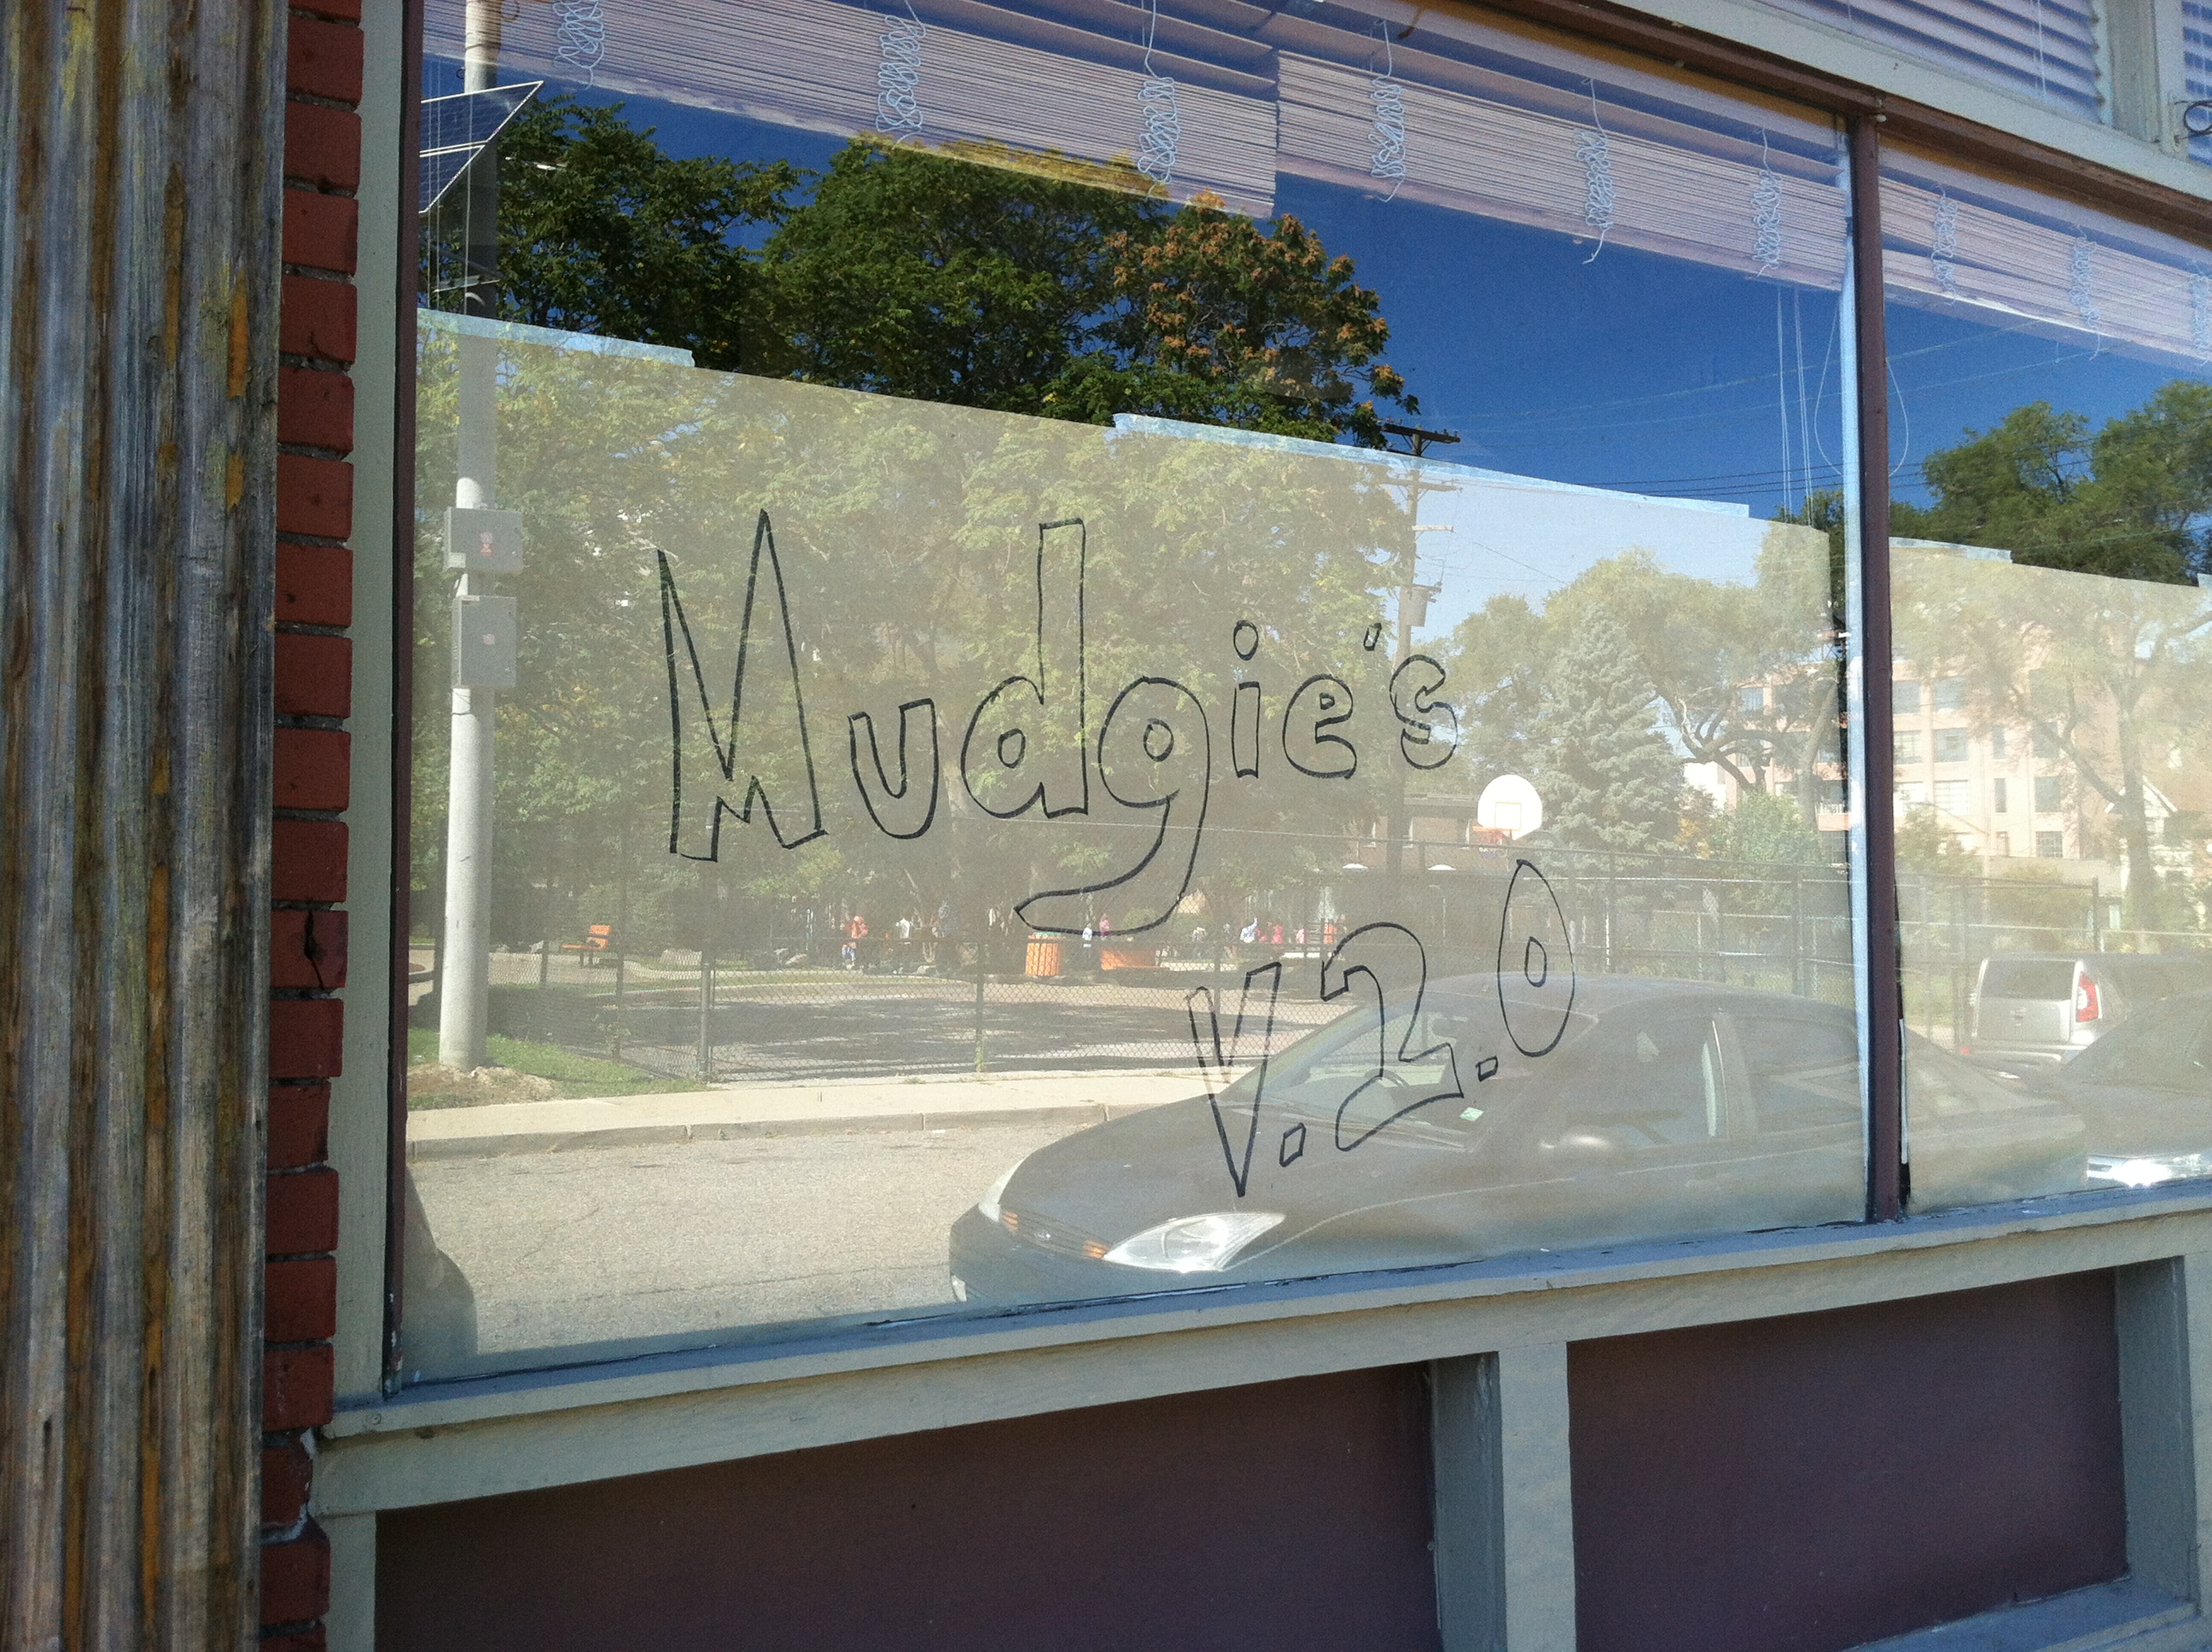 Mudgie's.